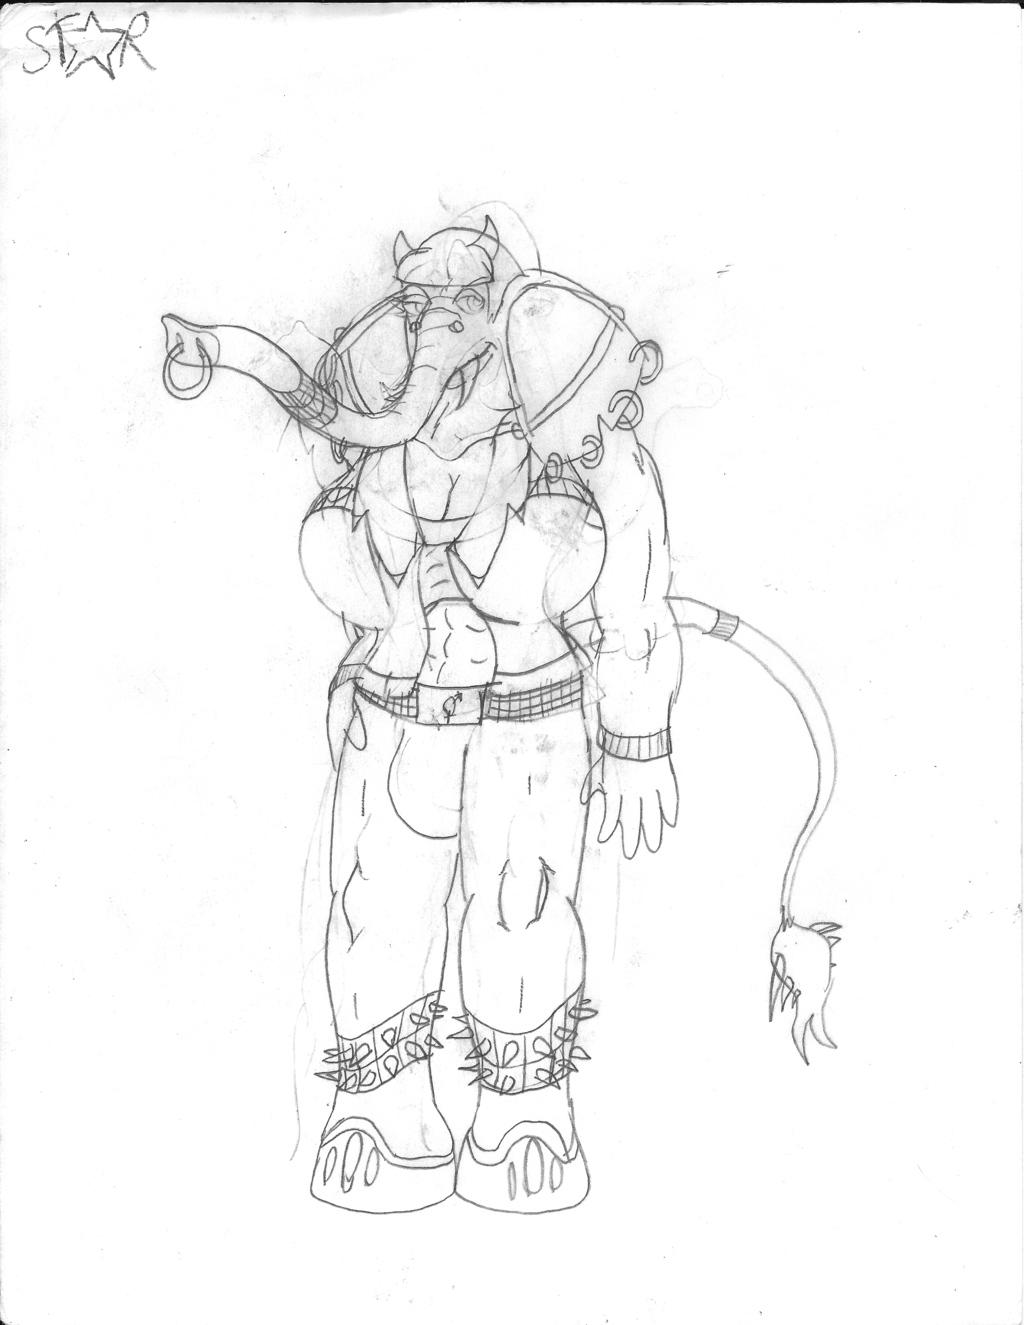 Most recent image: (Sketch) Star